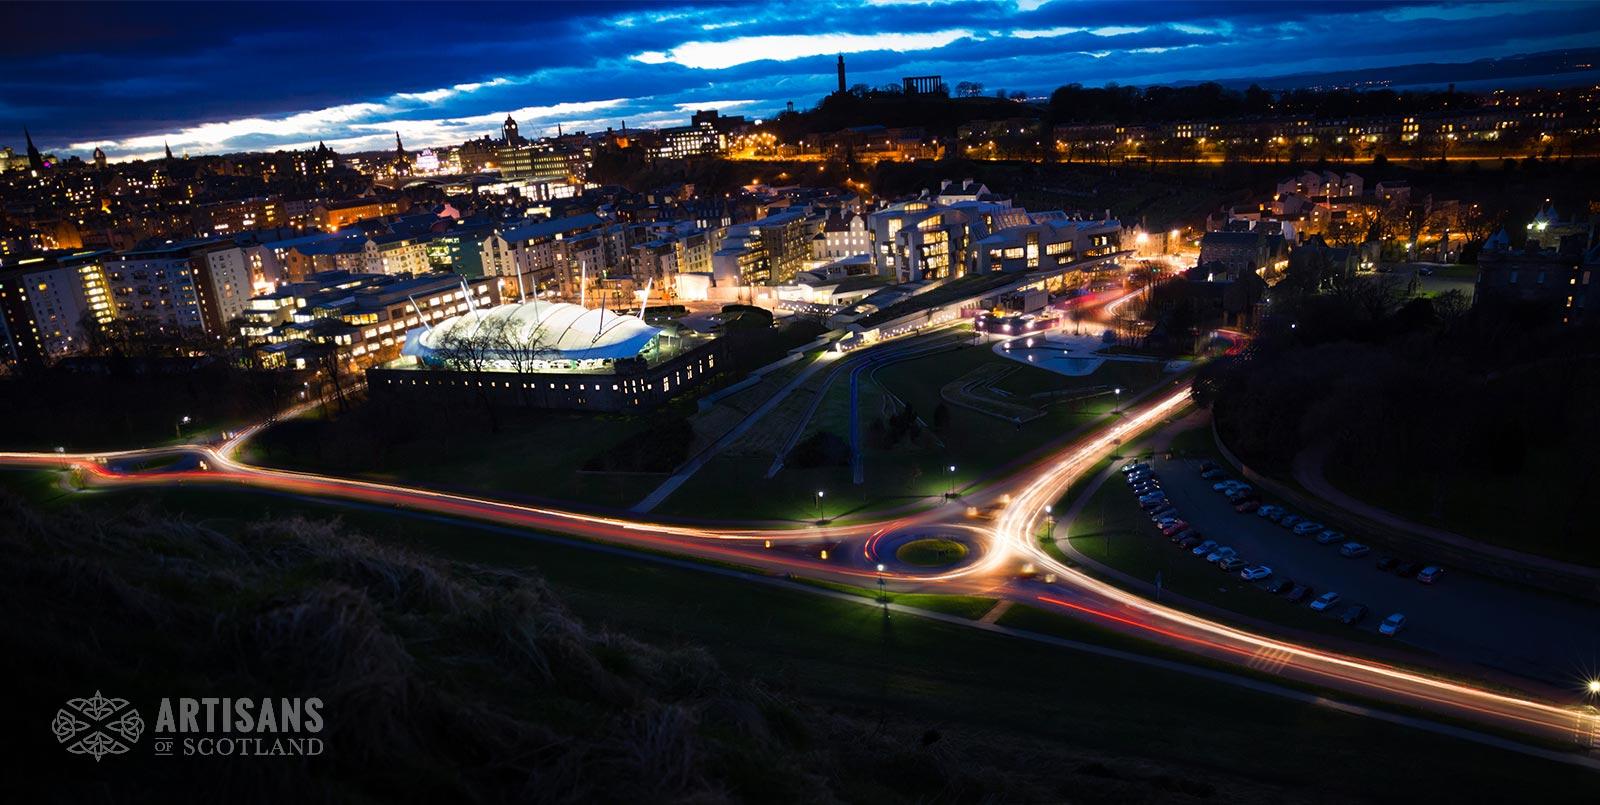 Edinburgh Night Skyline - The most beautiful places in Scotland